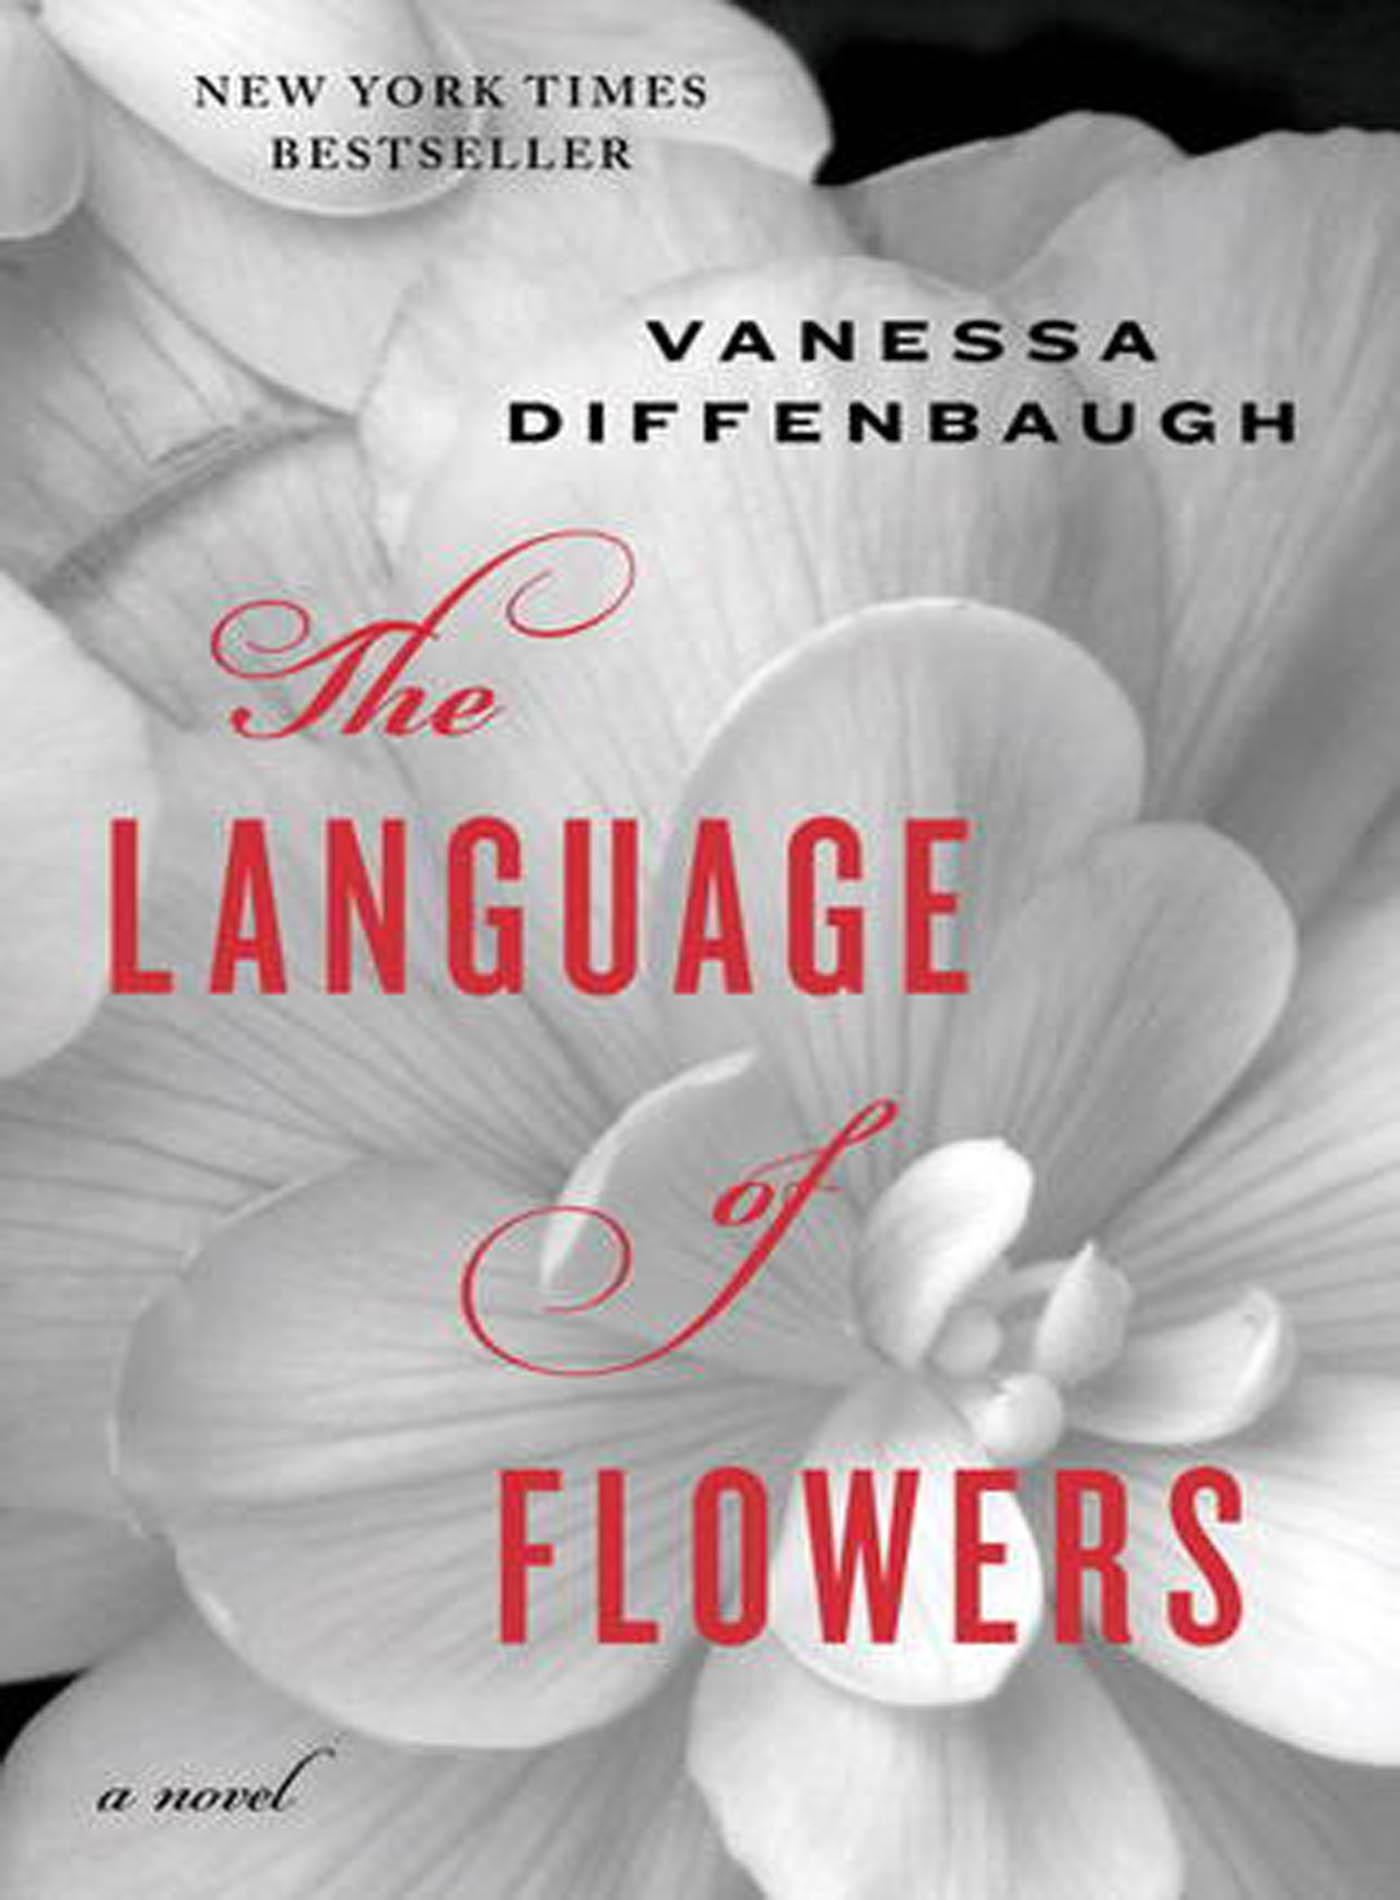 VanessaDiffenbaugh_Language.jpg